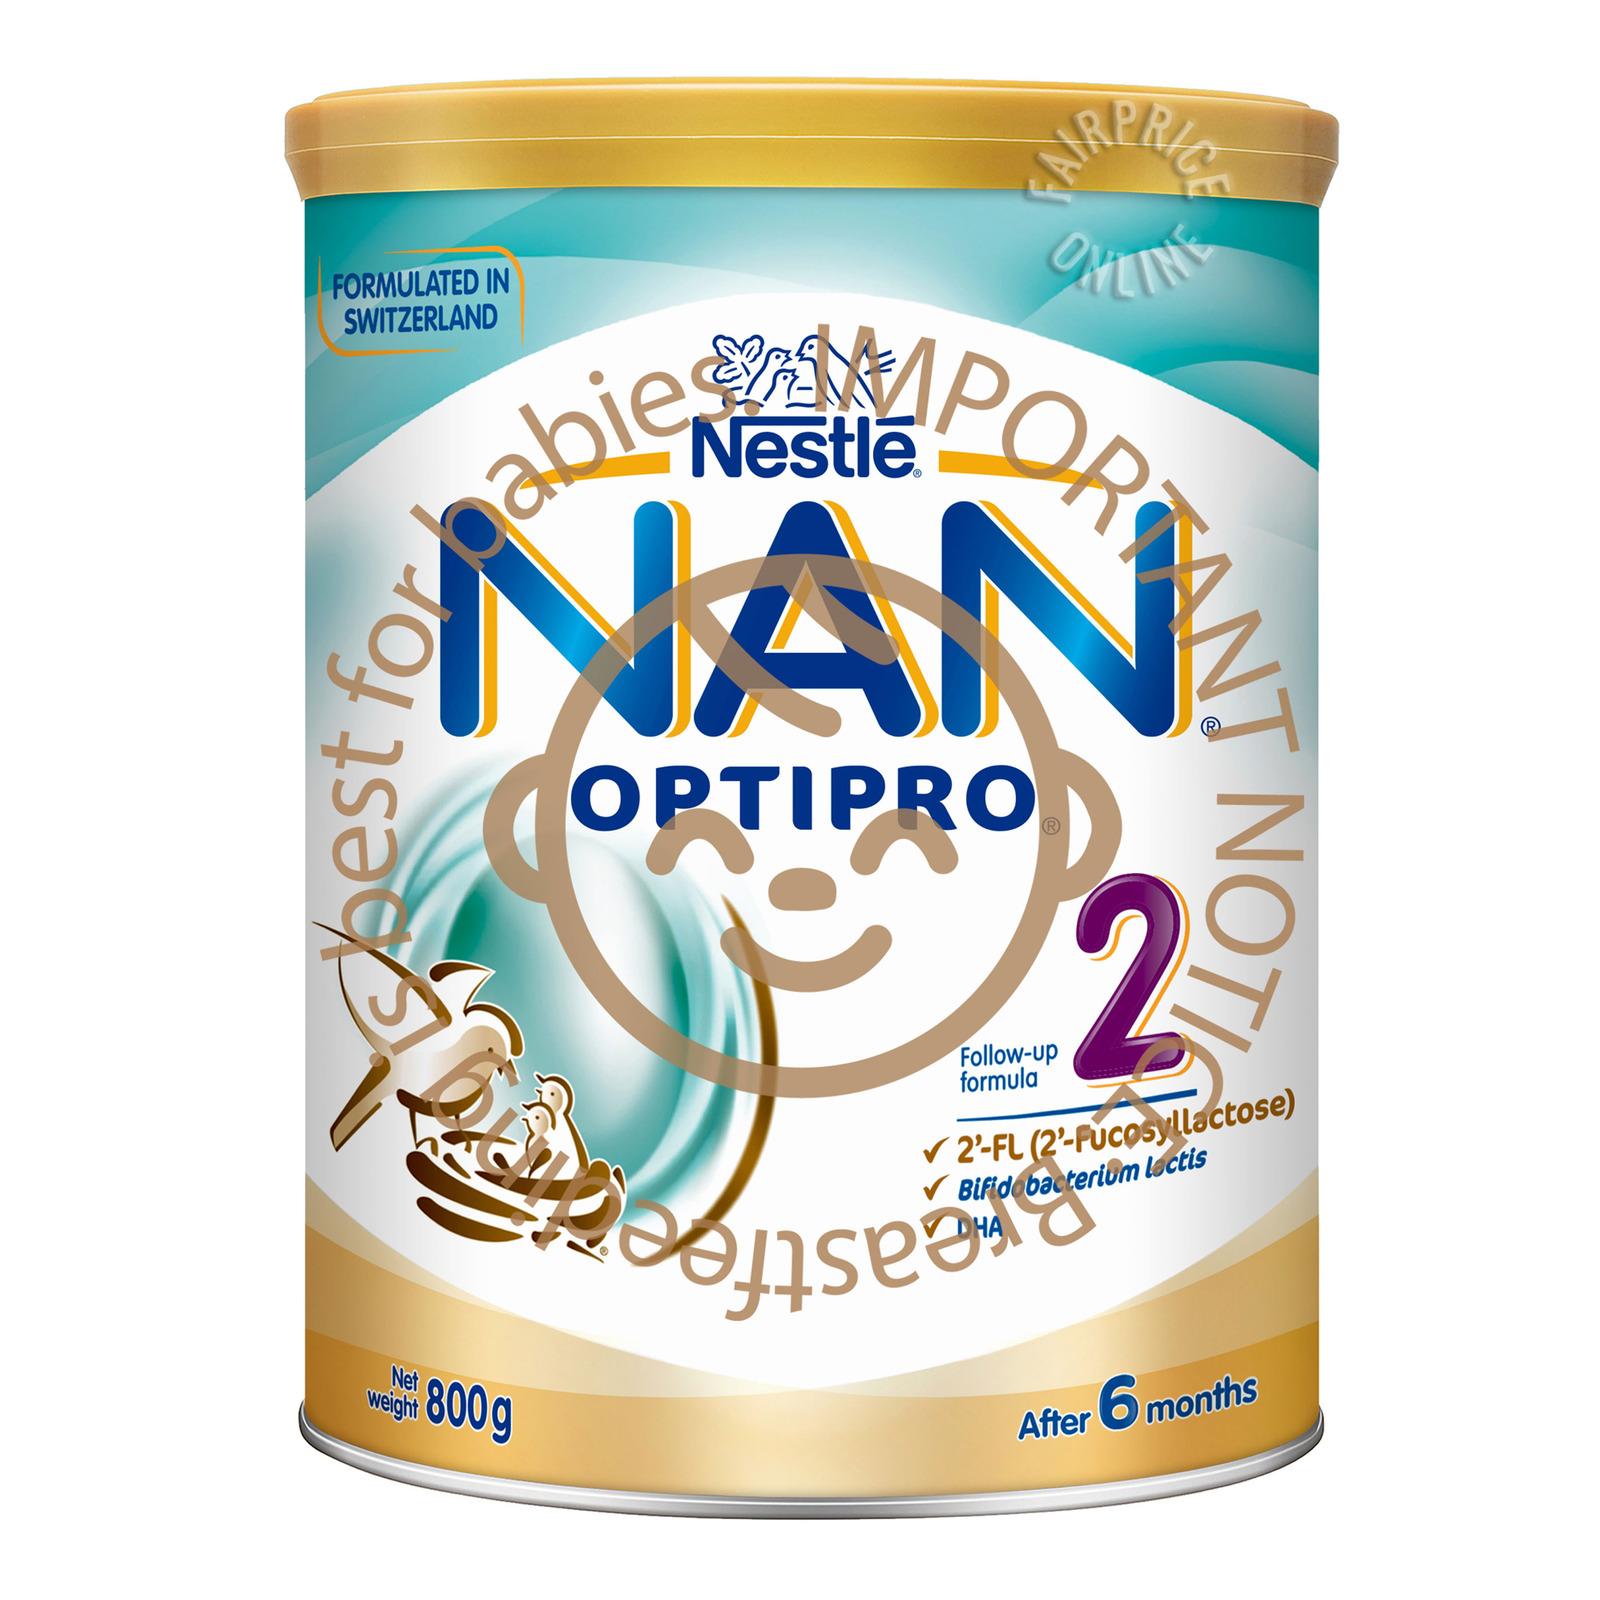 Nestle Nan Optipro Follow Up Formula 2'-FL - Stage 2